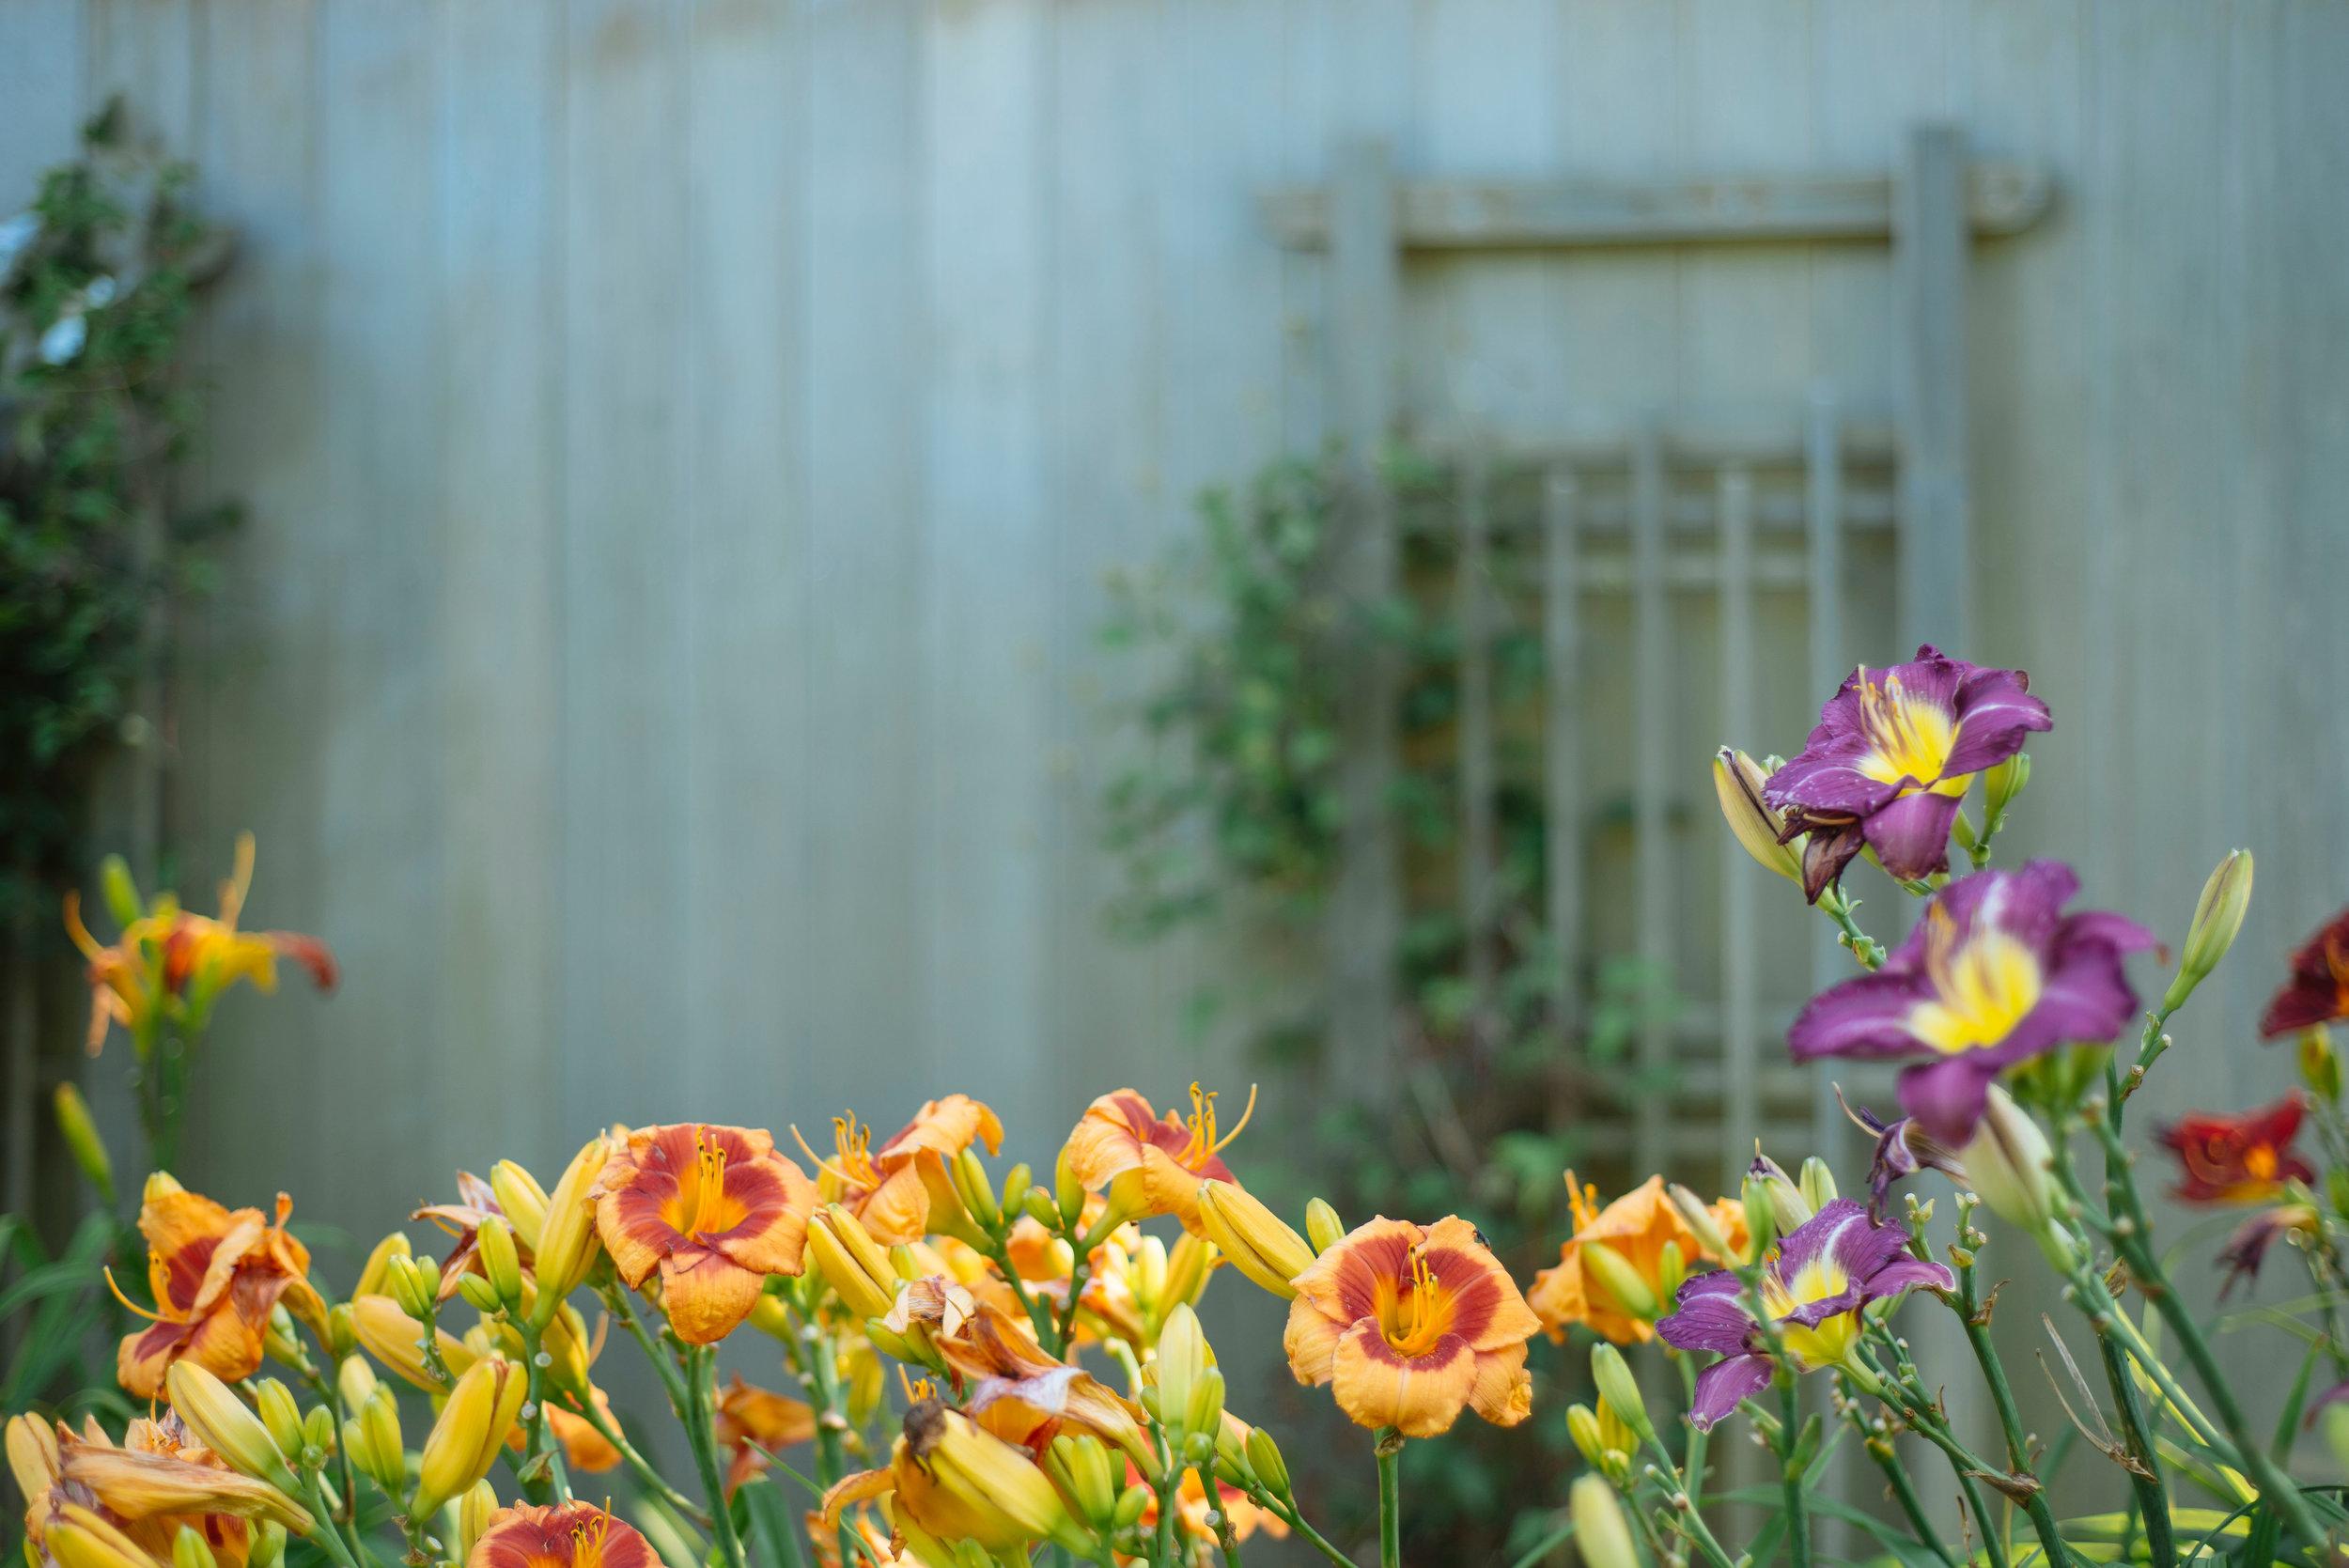 Flowers - This Week's Green Tip - Powe. Snowboards - Burlington, VT